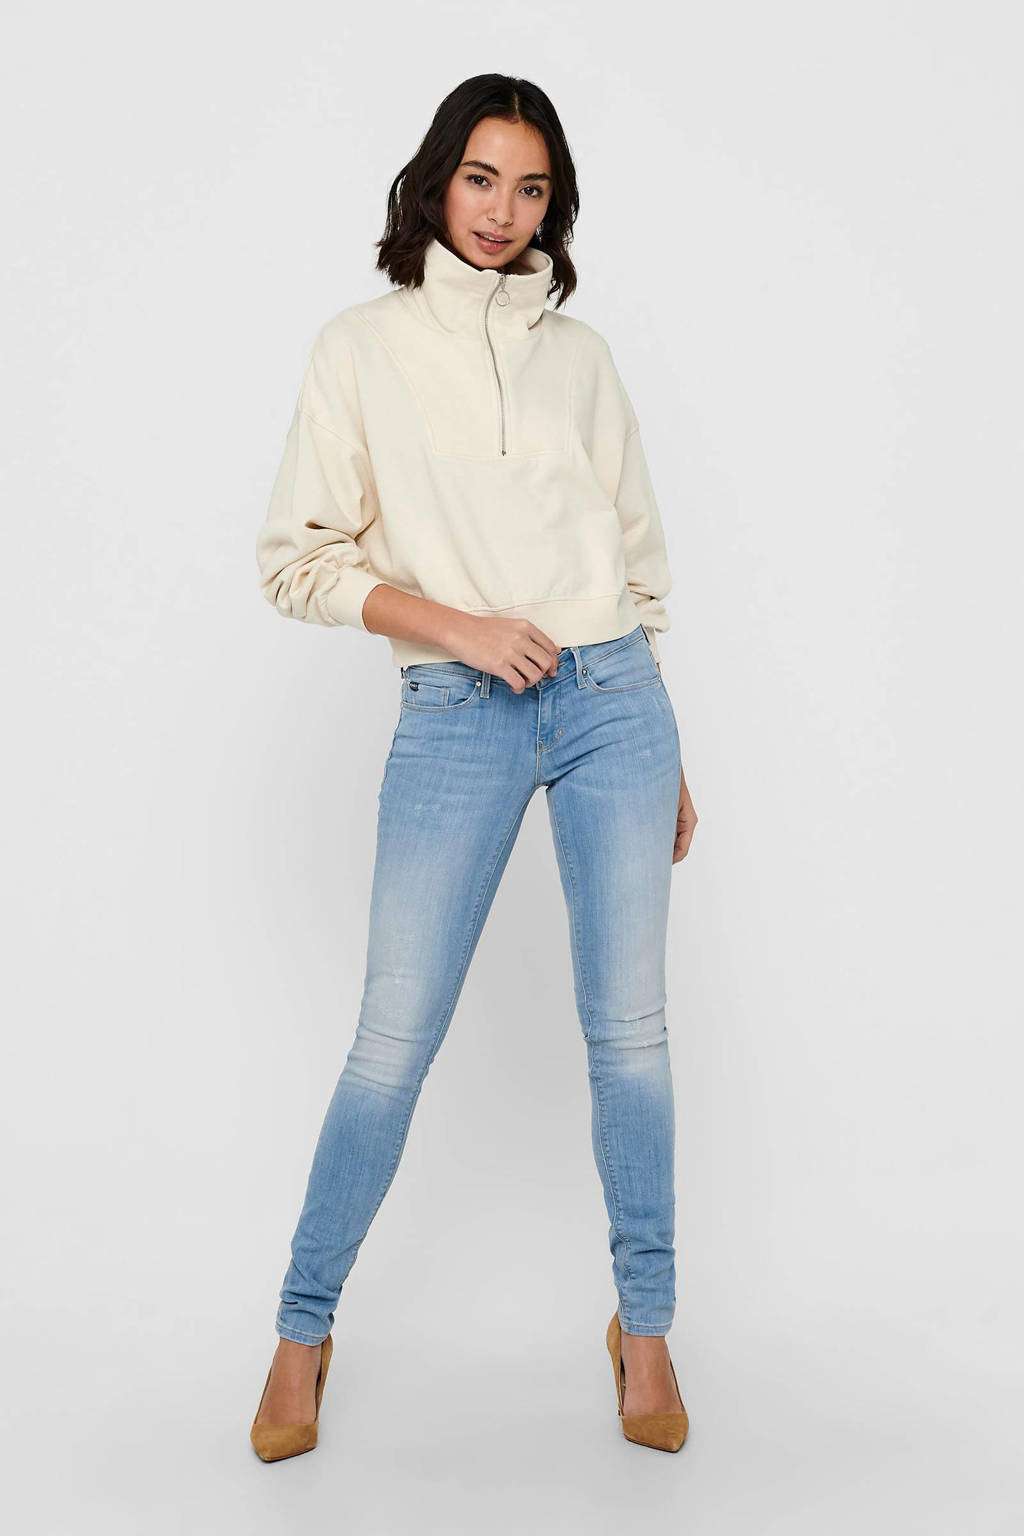 ONLY extra low waist skinny jeans ONLCORAL blue light denim, Blue light denim